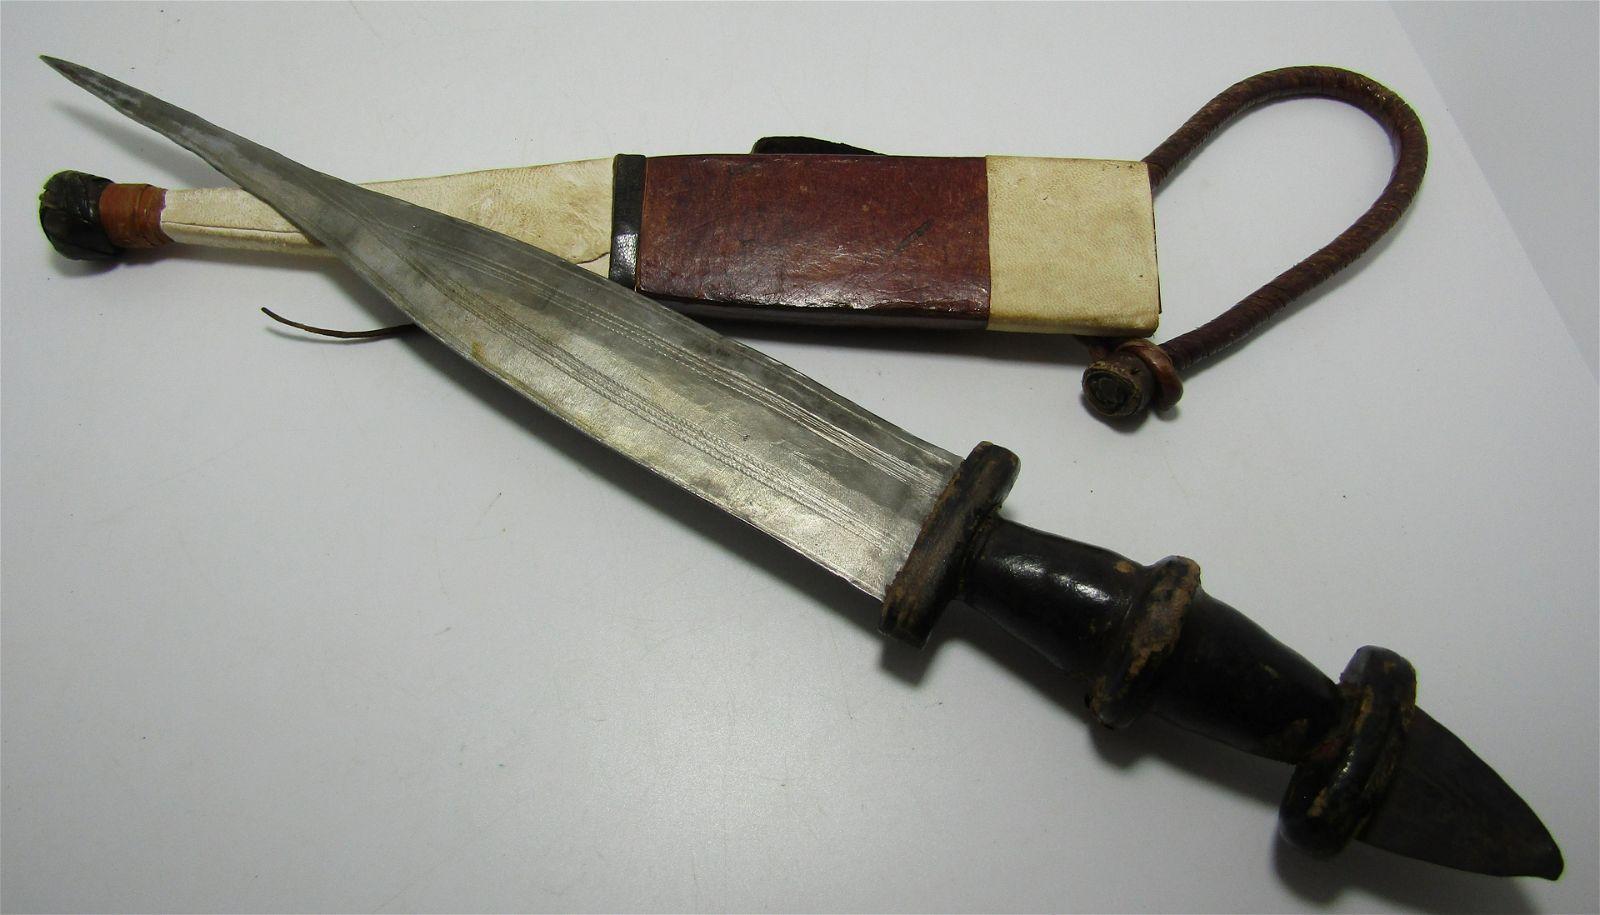 MIDDLE EAST ARAB DAGGER KNIFE